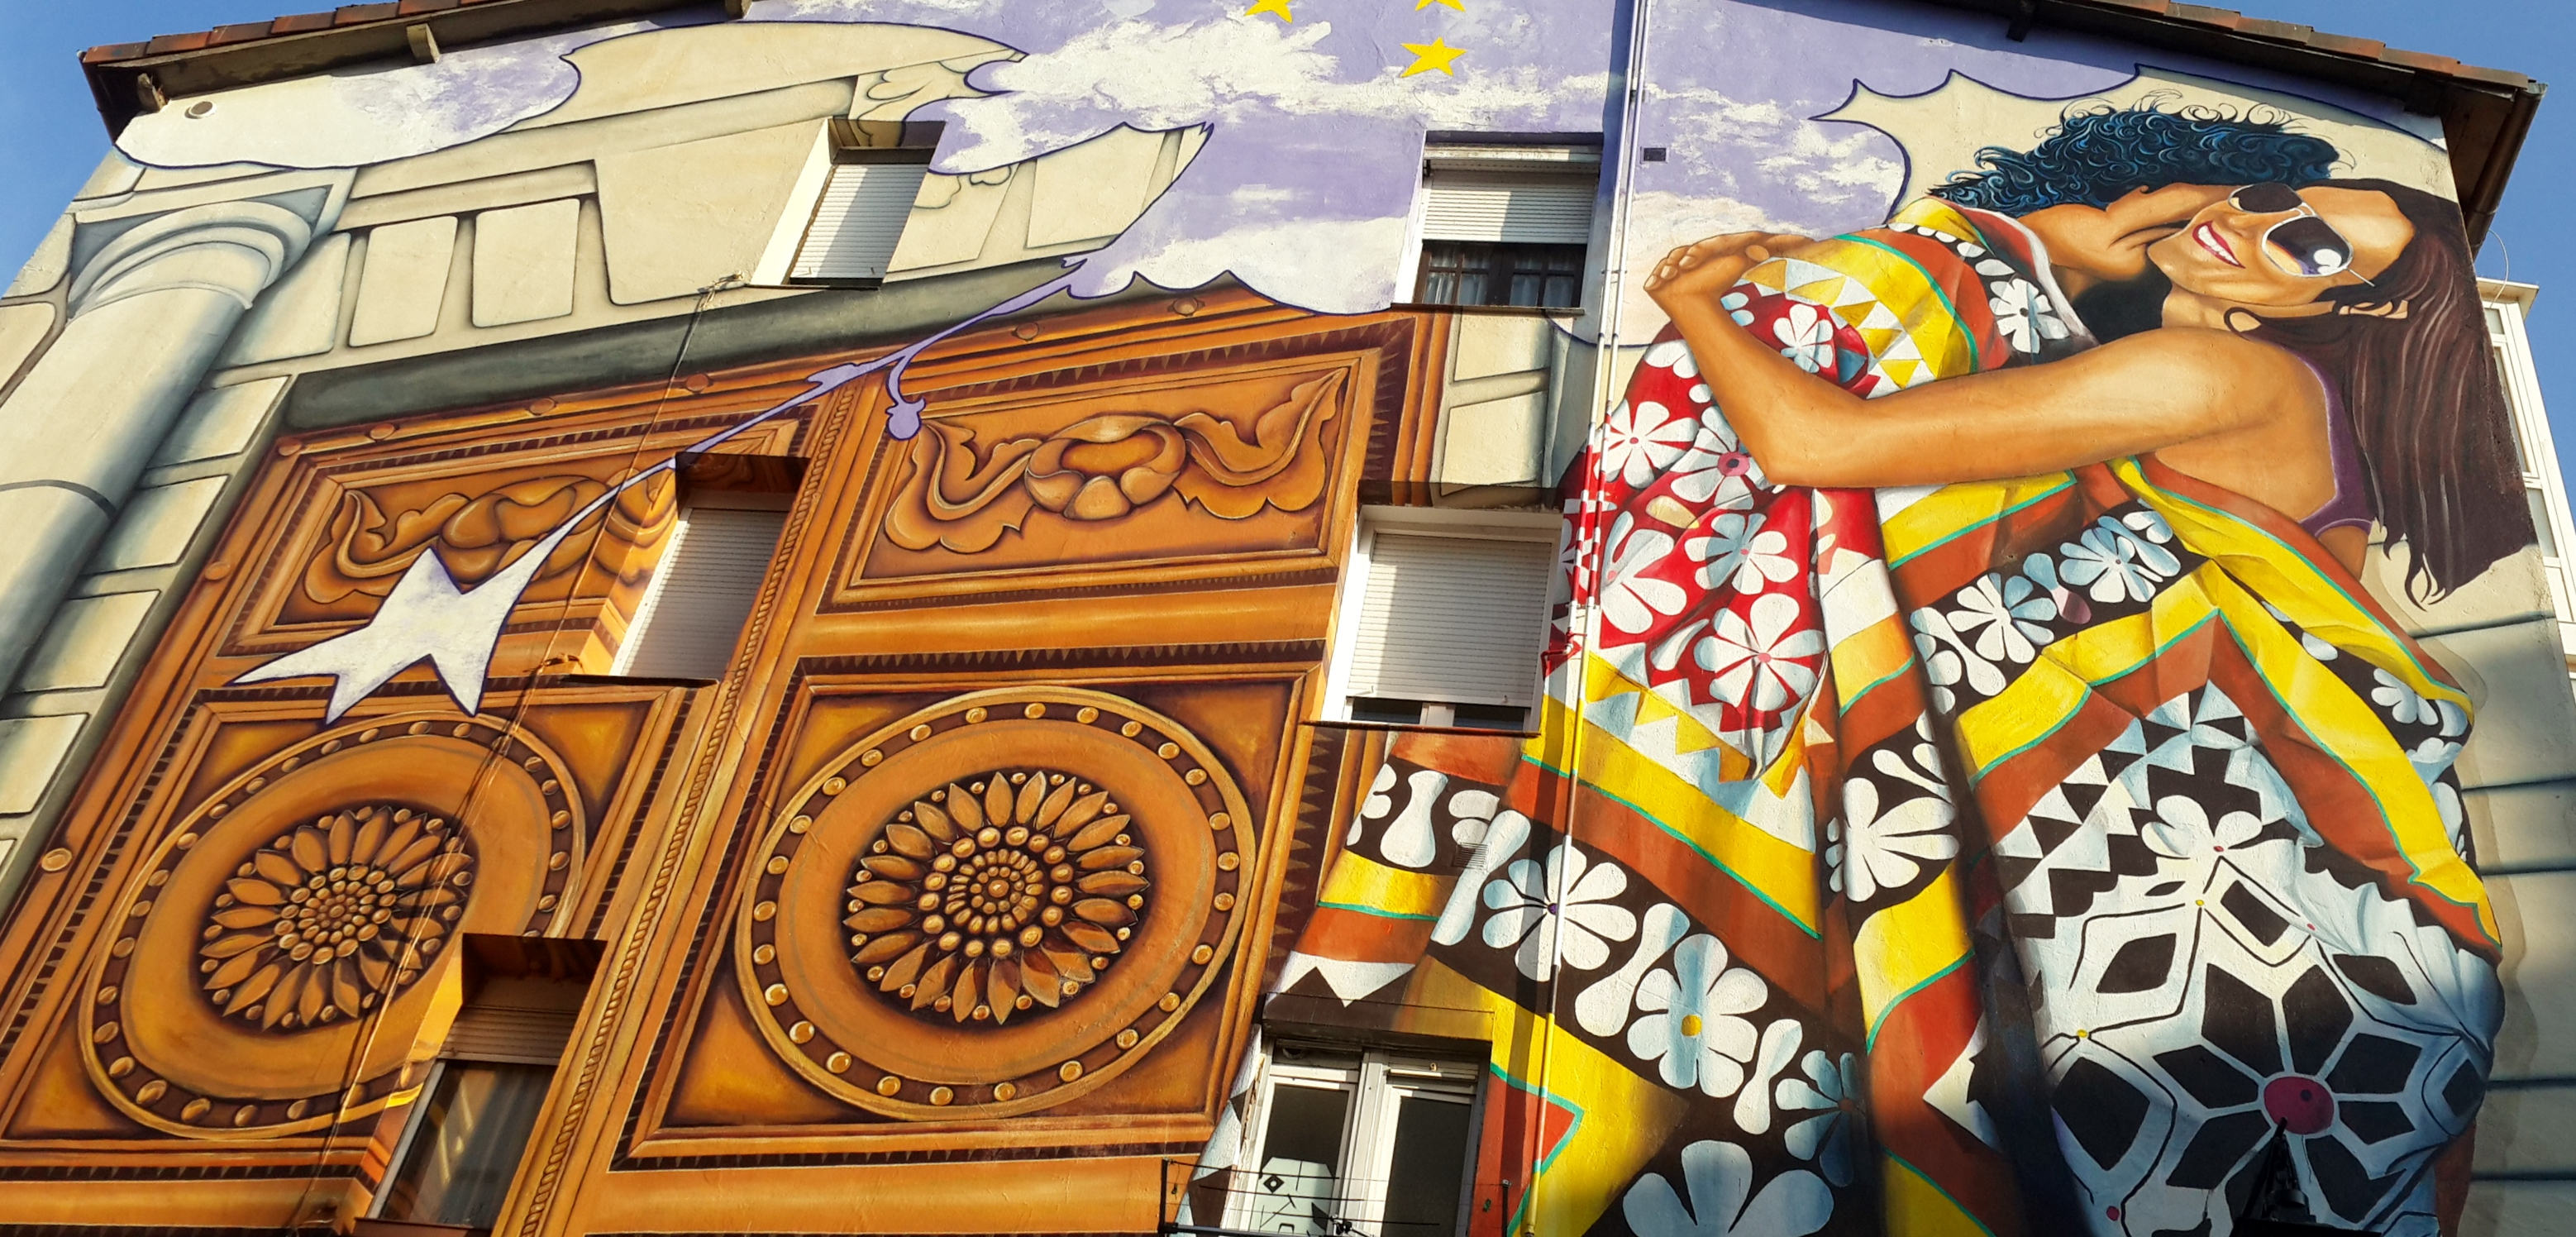 murales públicos Vitoria-Gasteiz: street art